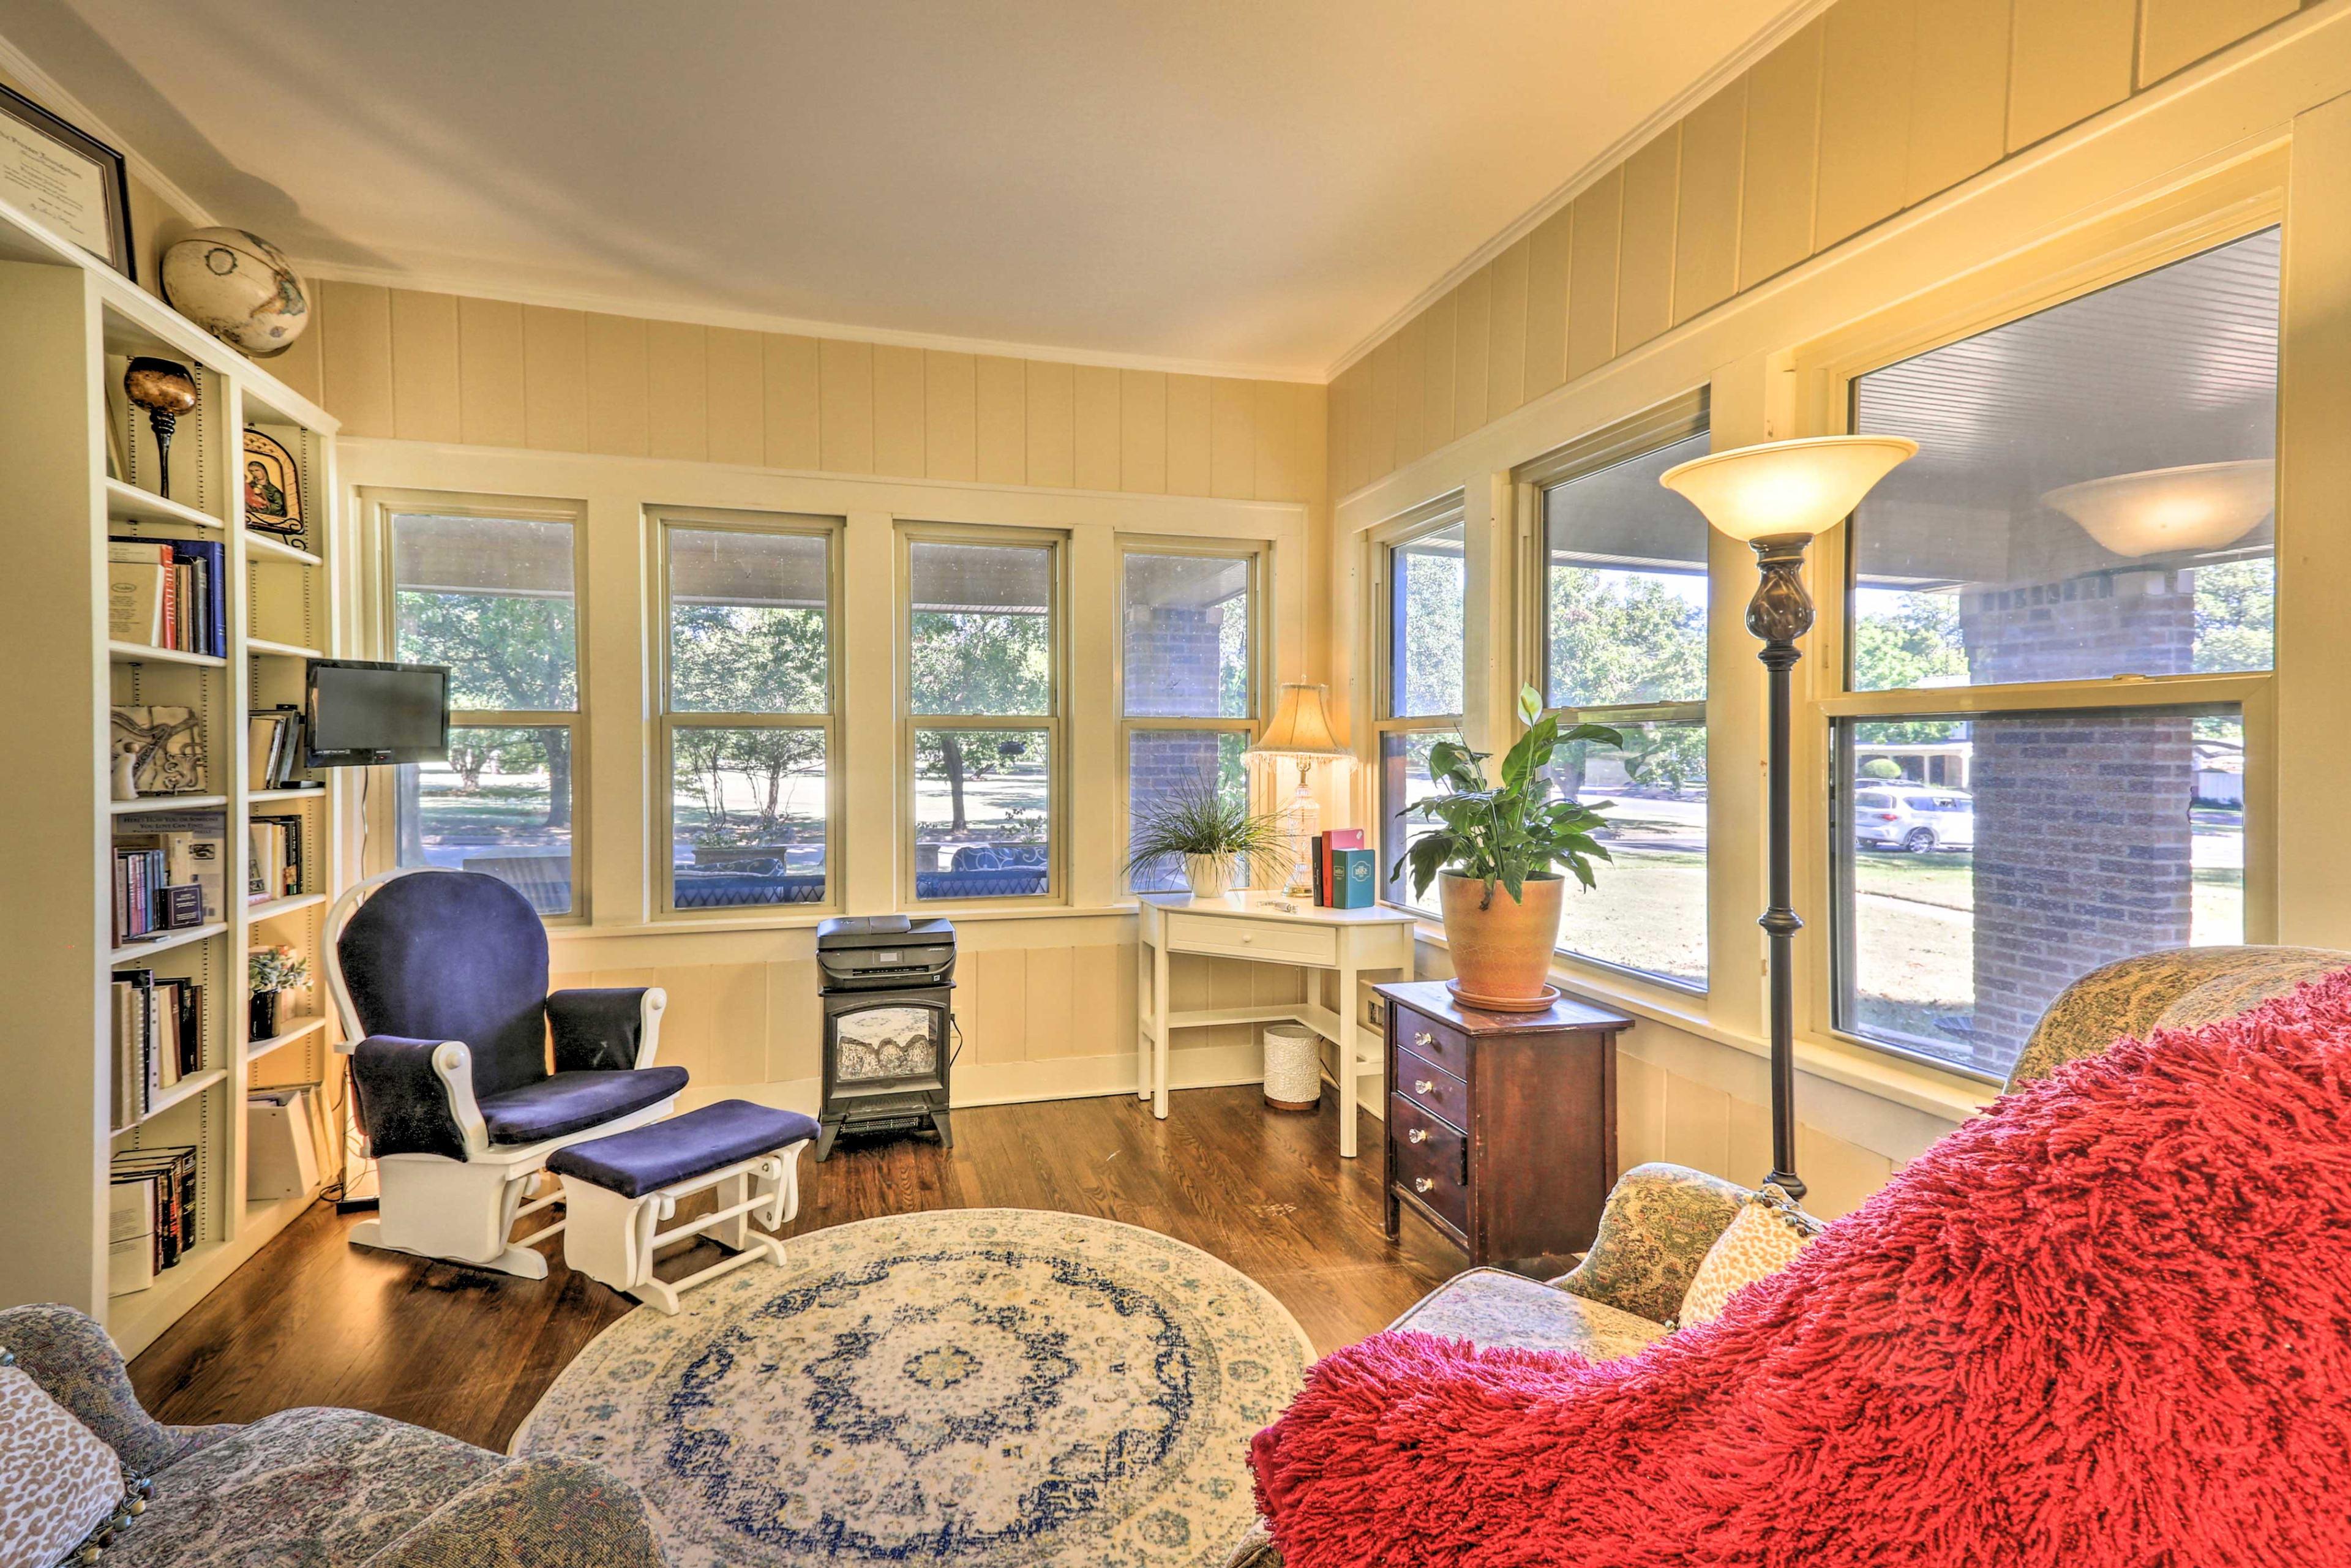 Original hardwood floors complete this North Texas abode.